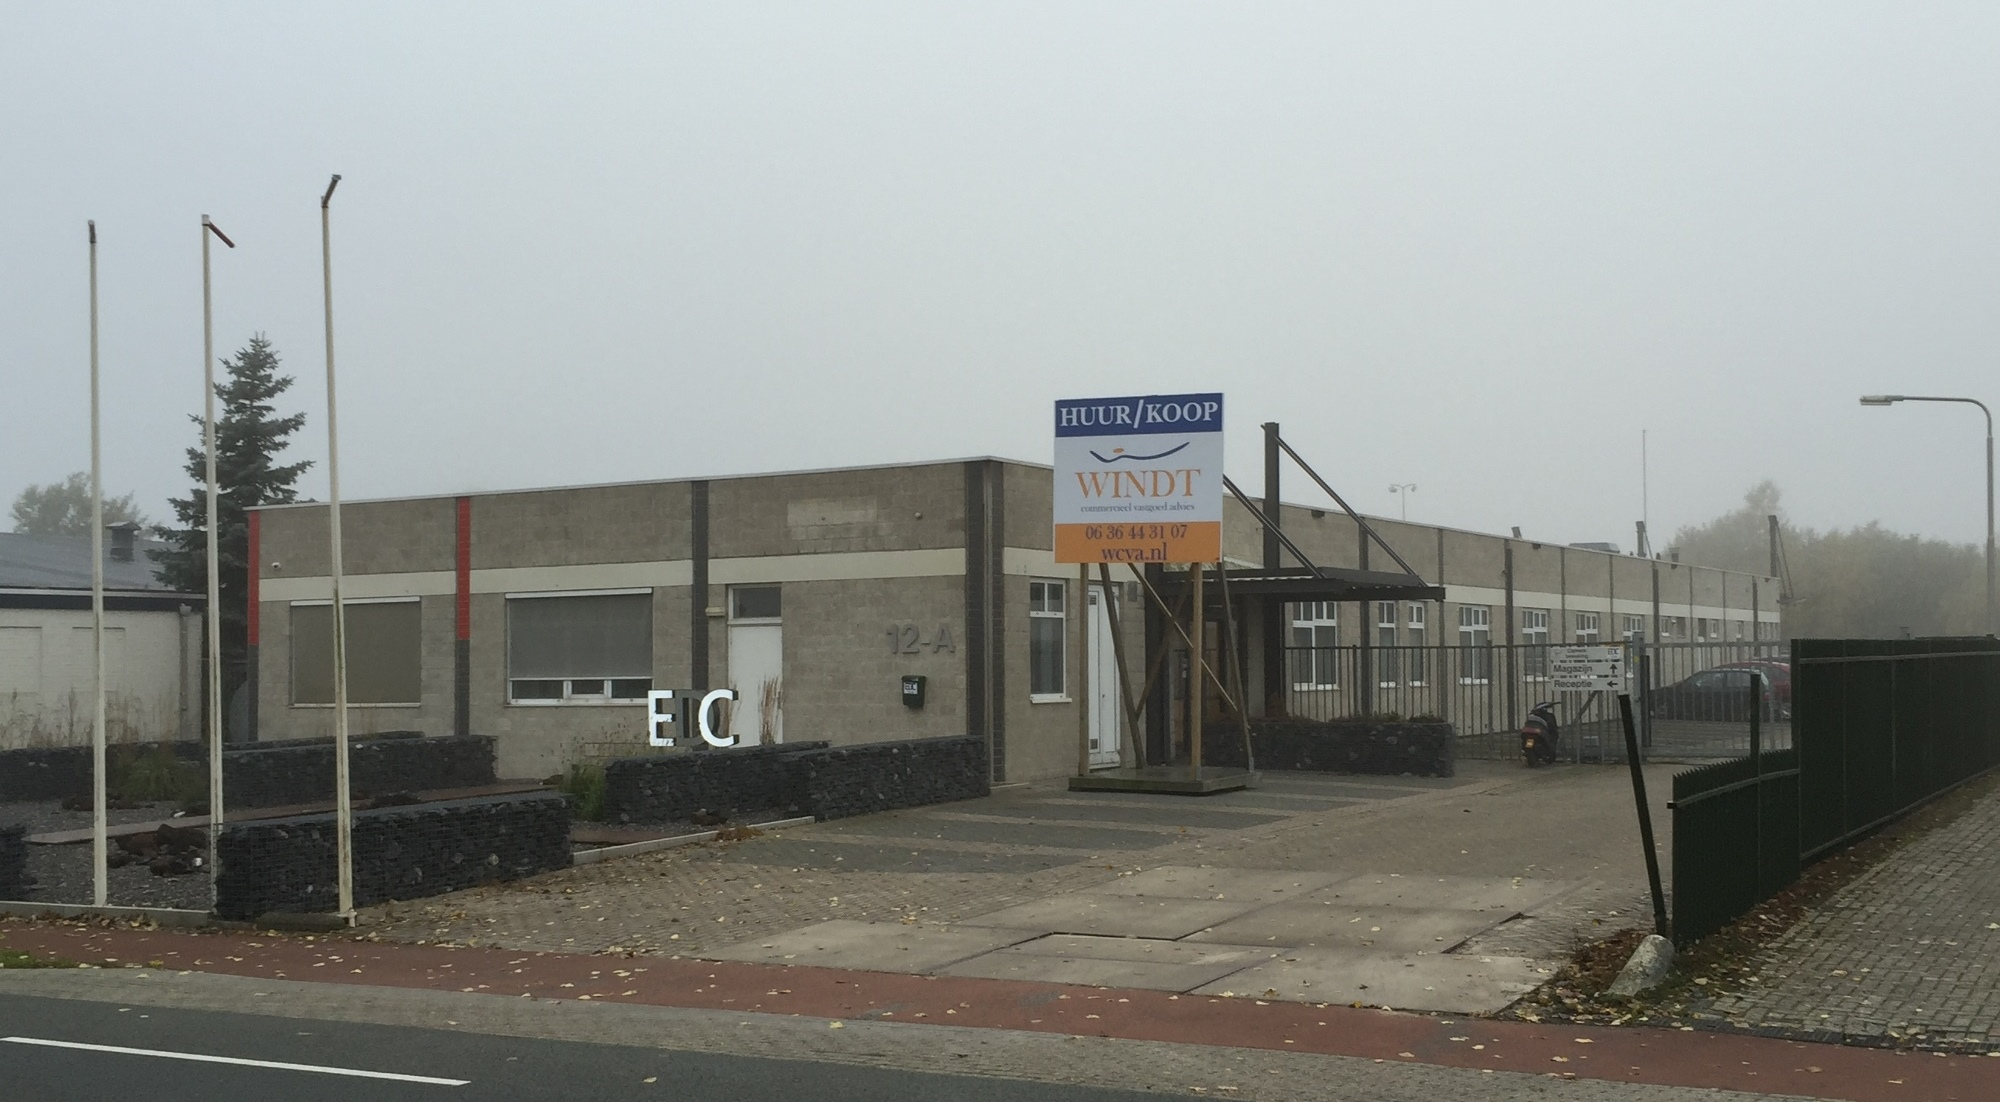 Veendam, Lloydsweg 12a Koop / Belegging